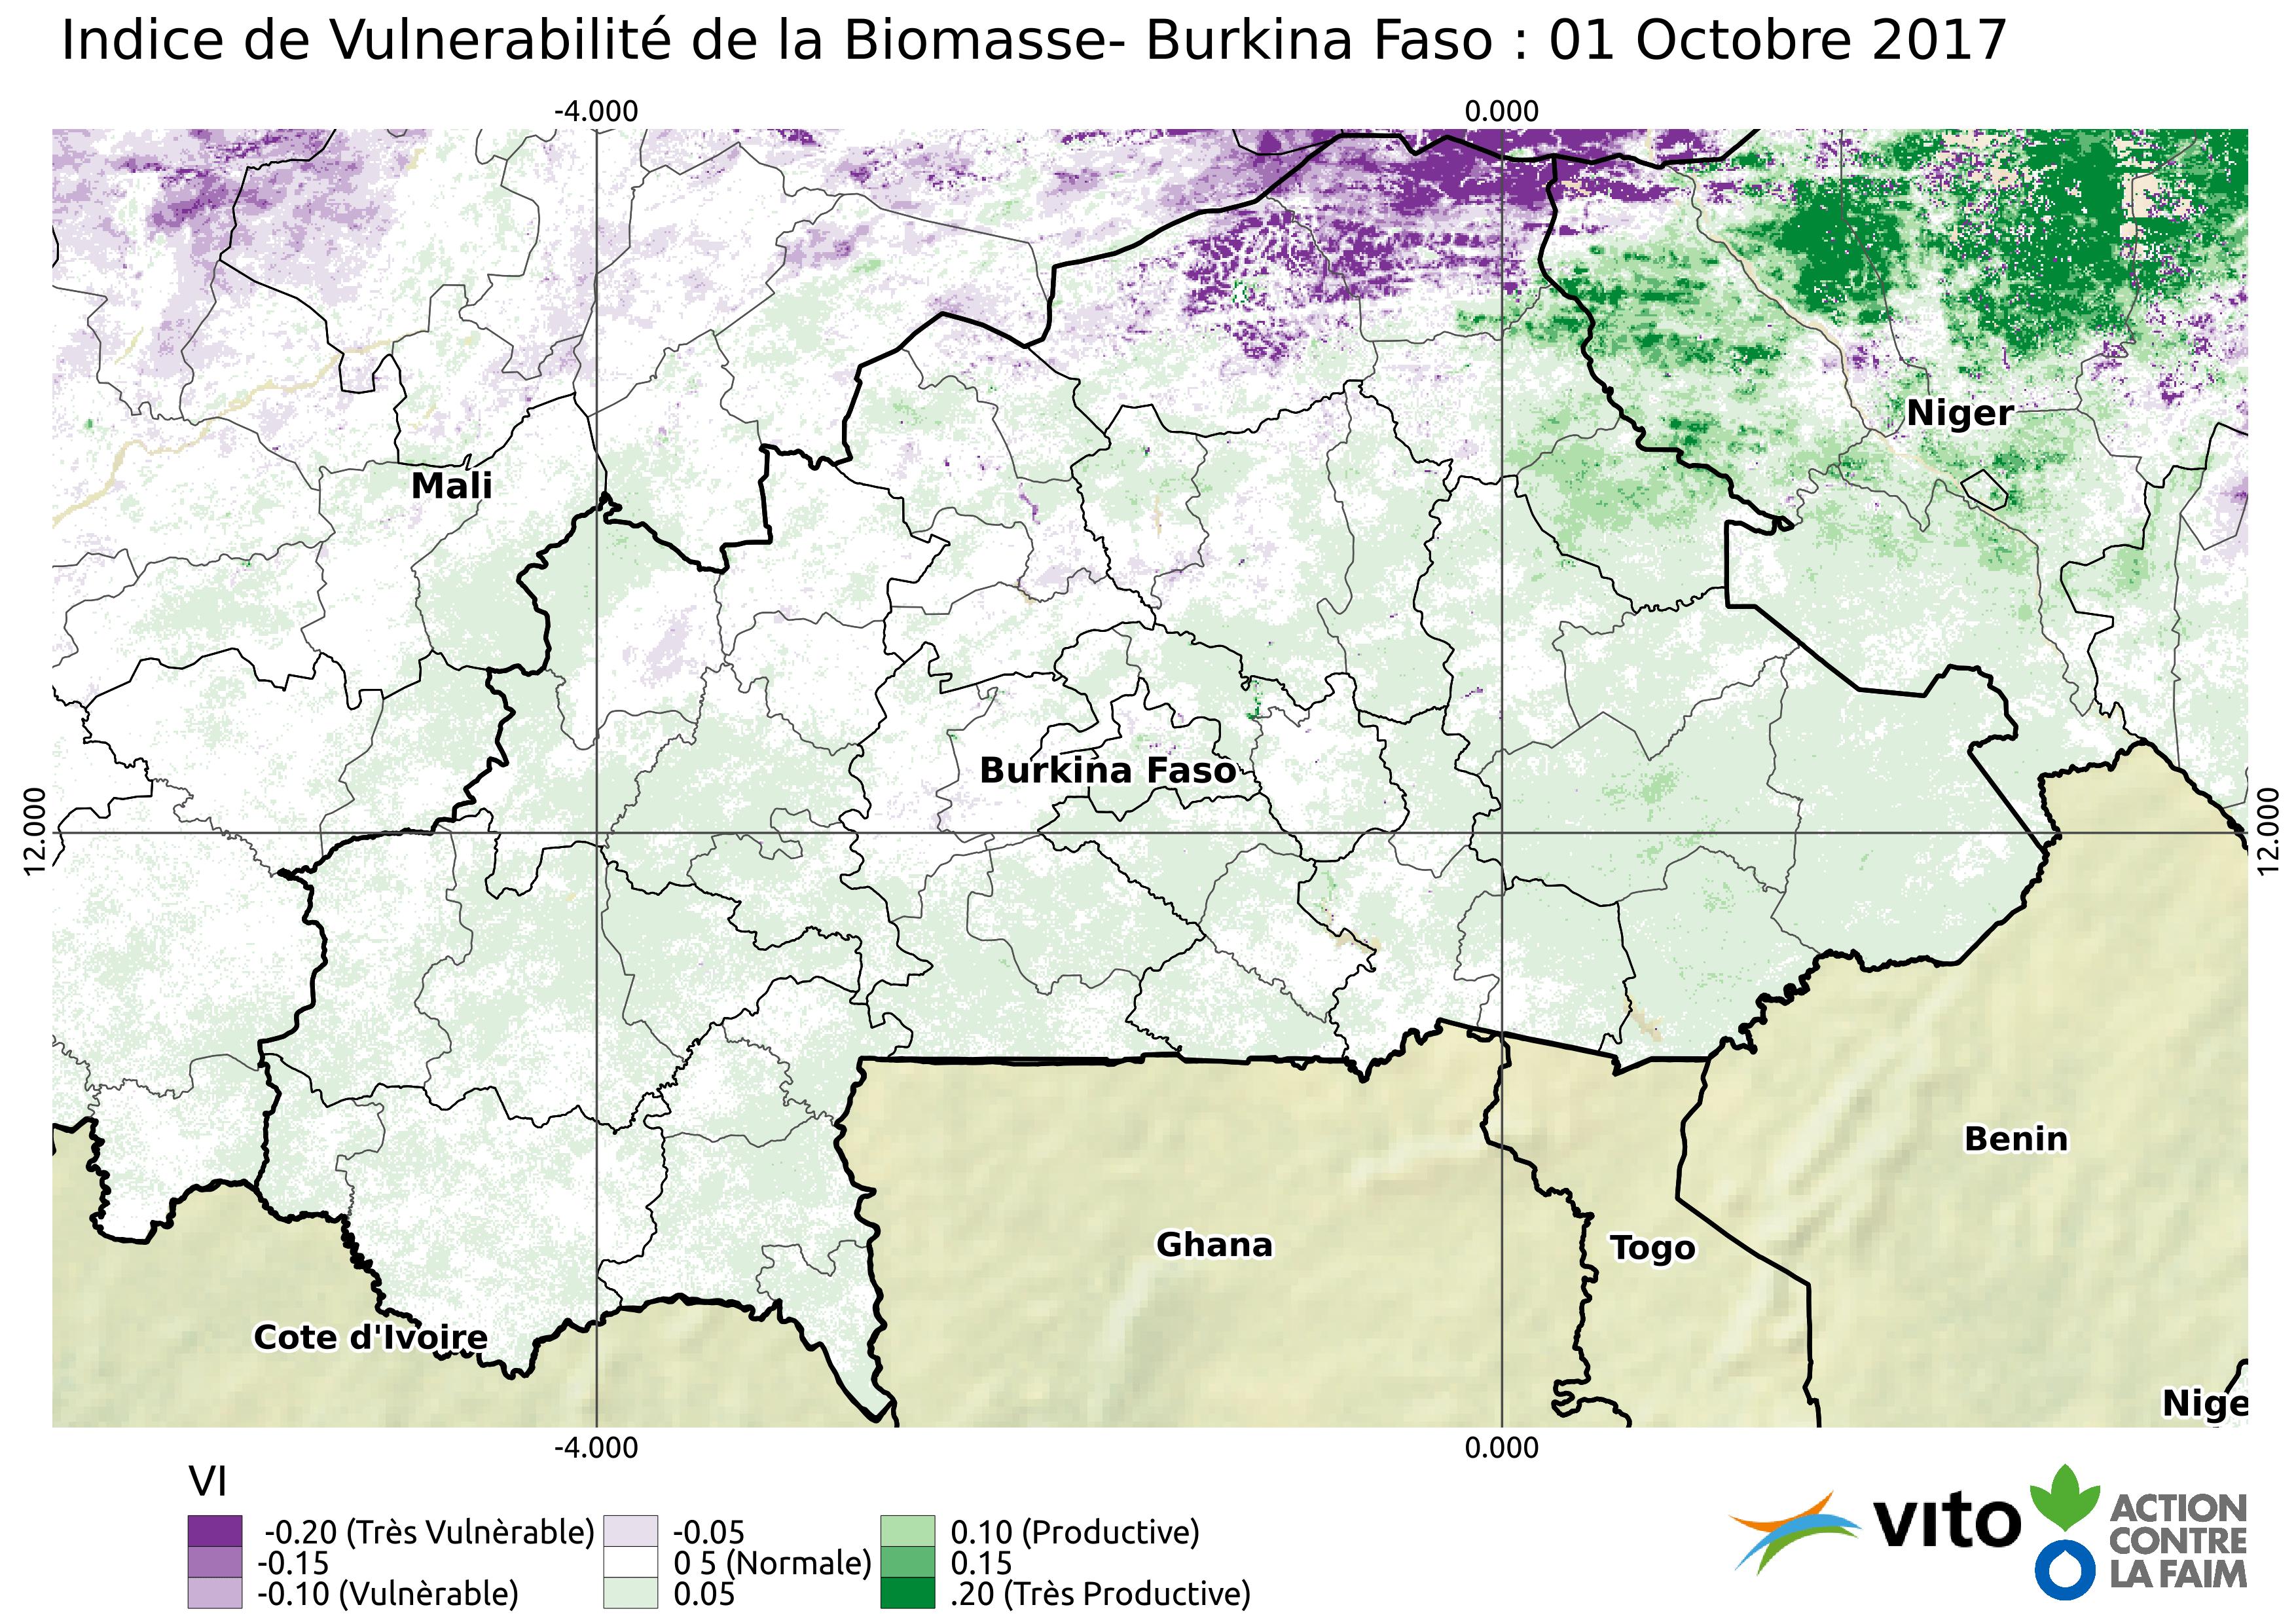 Indice de Vulnerabilité Burkina Faso 2017